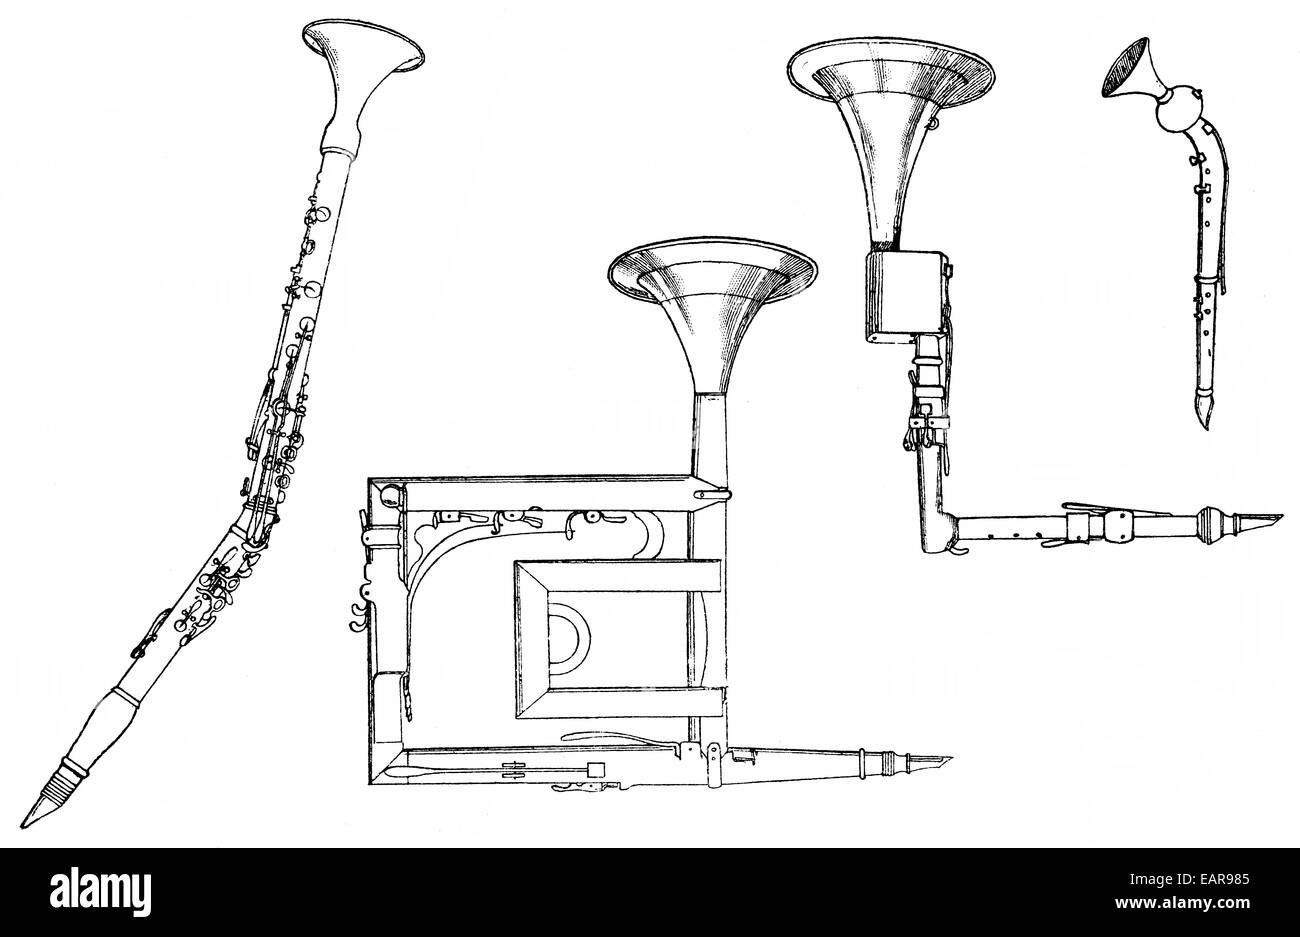 woodwind instruments, basset horn or corno bassetto, basset clarinet, Holzblasinstrumente, Bassetthorn oder corno - Stock Image